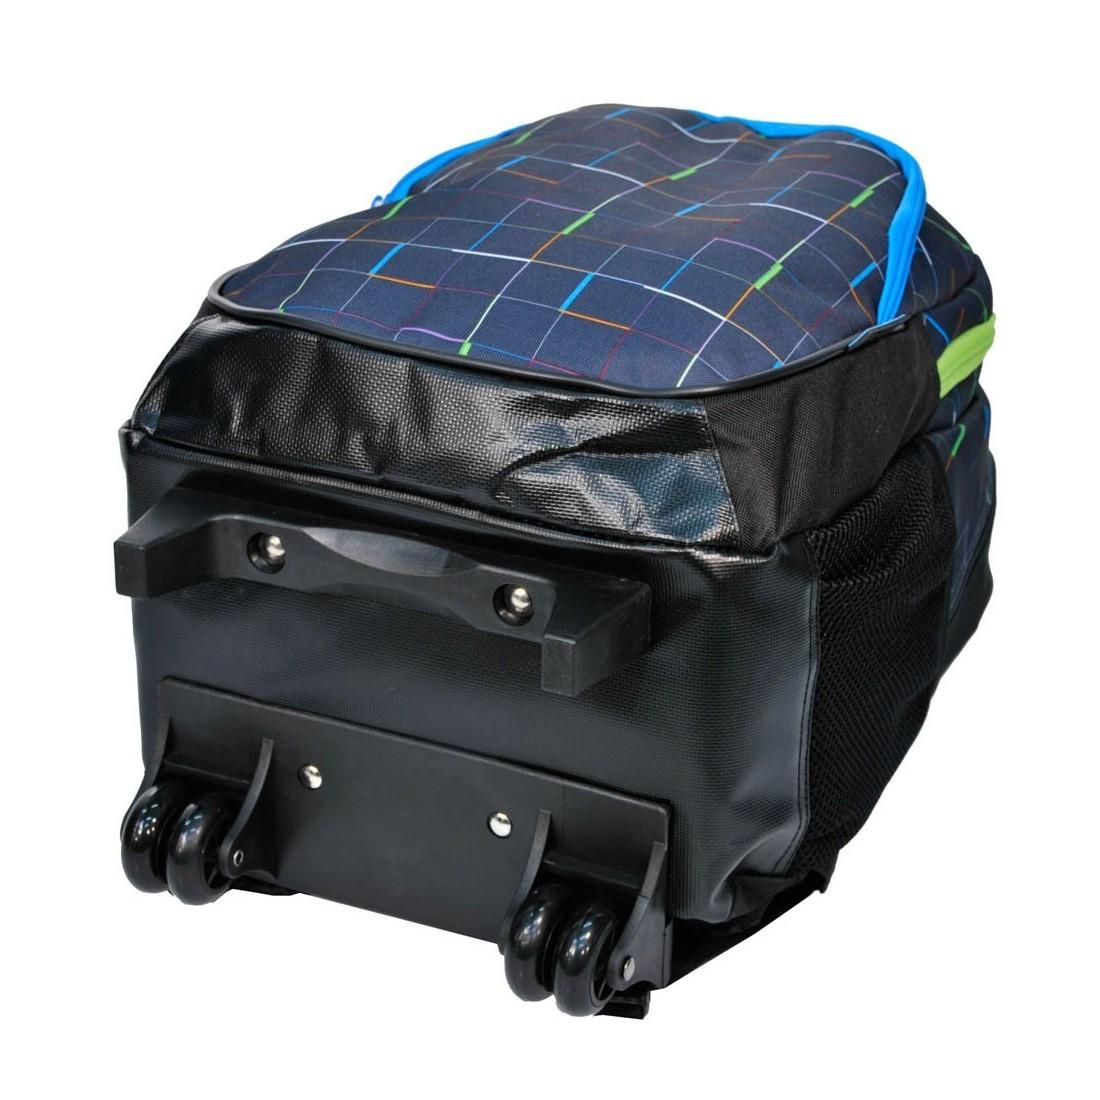 Plecak na kółkach w kolorowe kreski - plecak-tornister.pl